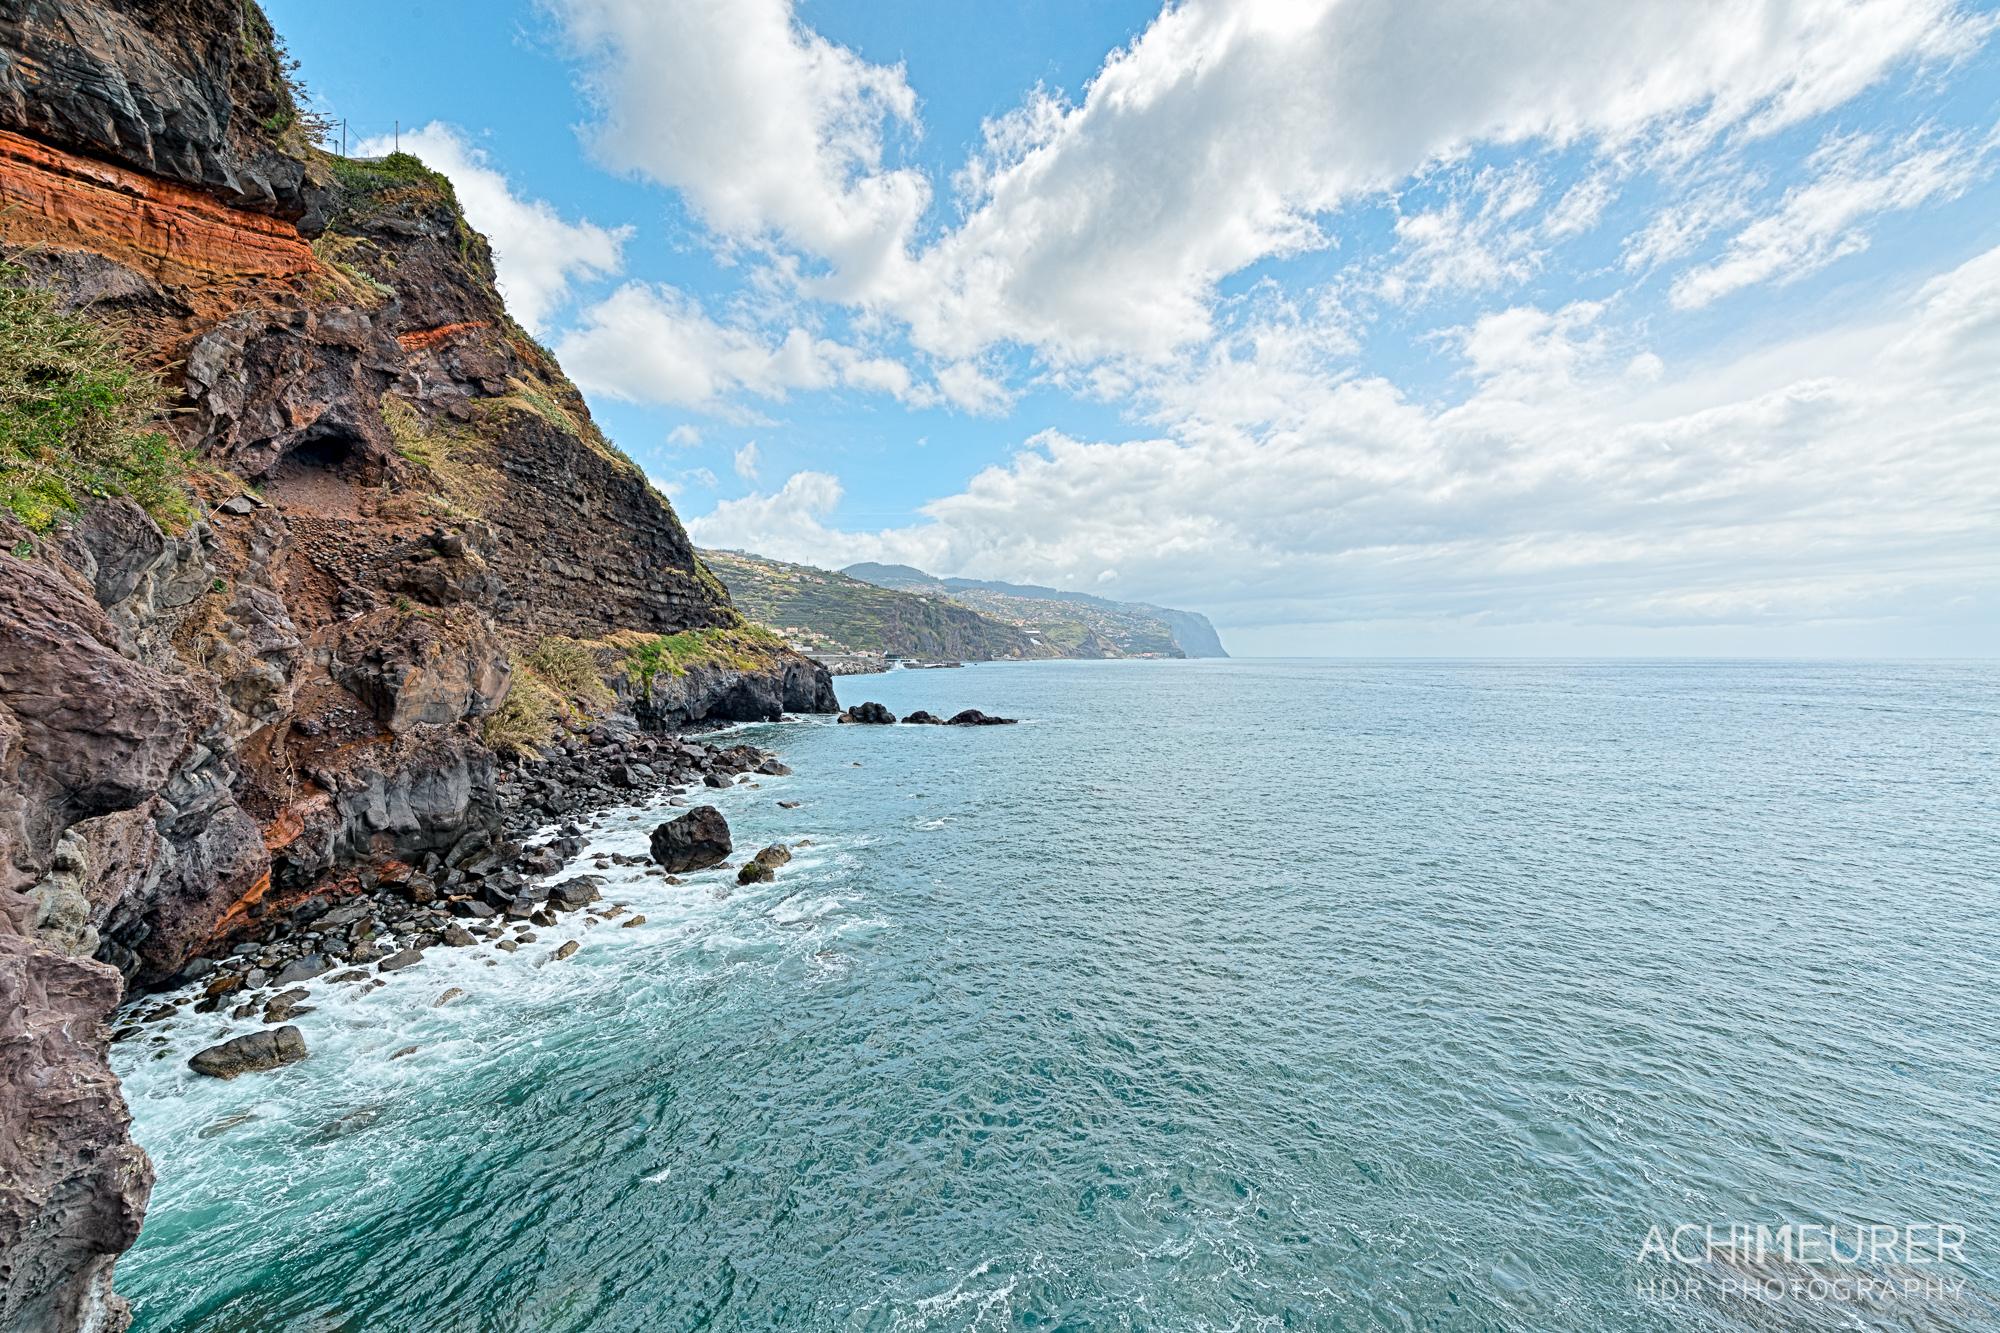 Madeira_6264_3_2_HDR